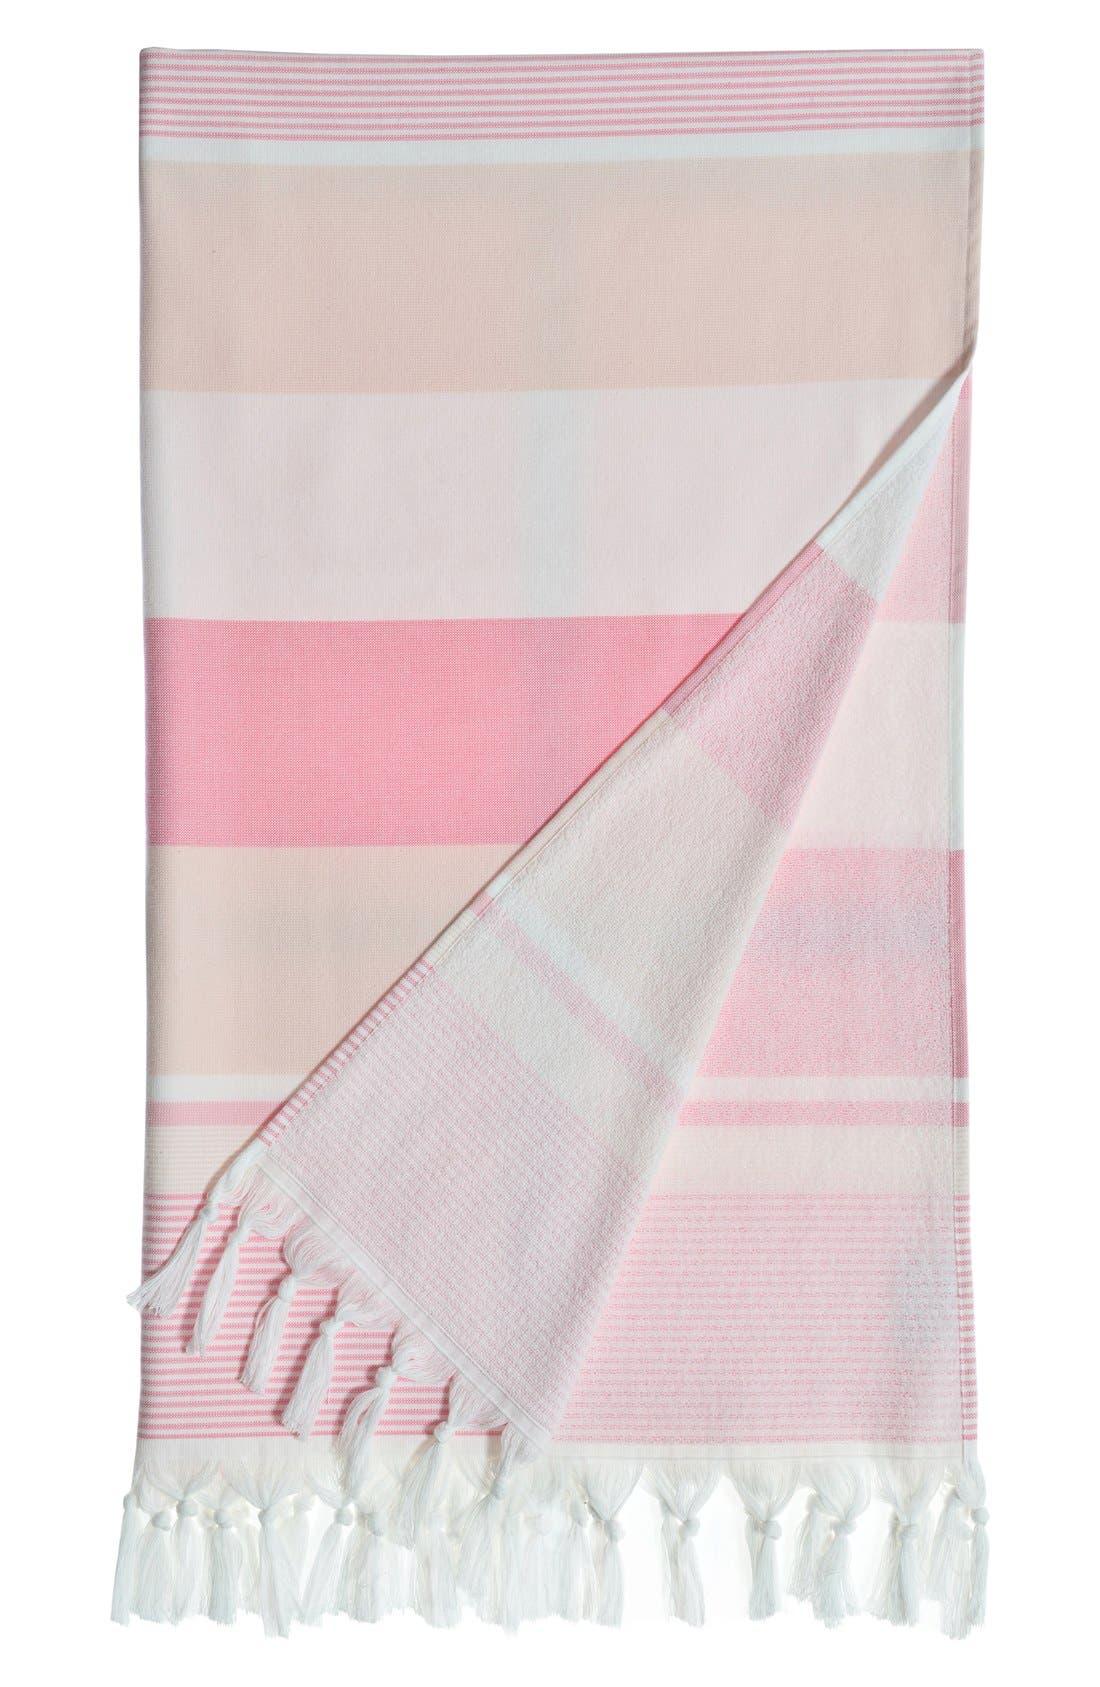 Alternate Image 1 Selected - Linum Home Textiles 'Summer Loving' Turkish Pestemal Towel